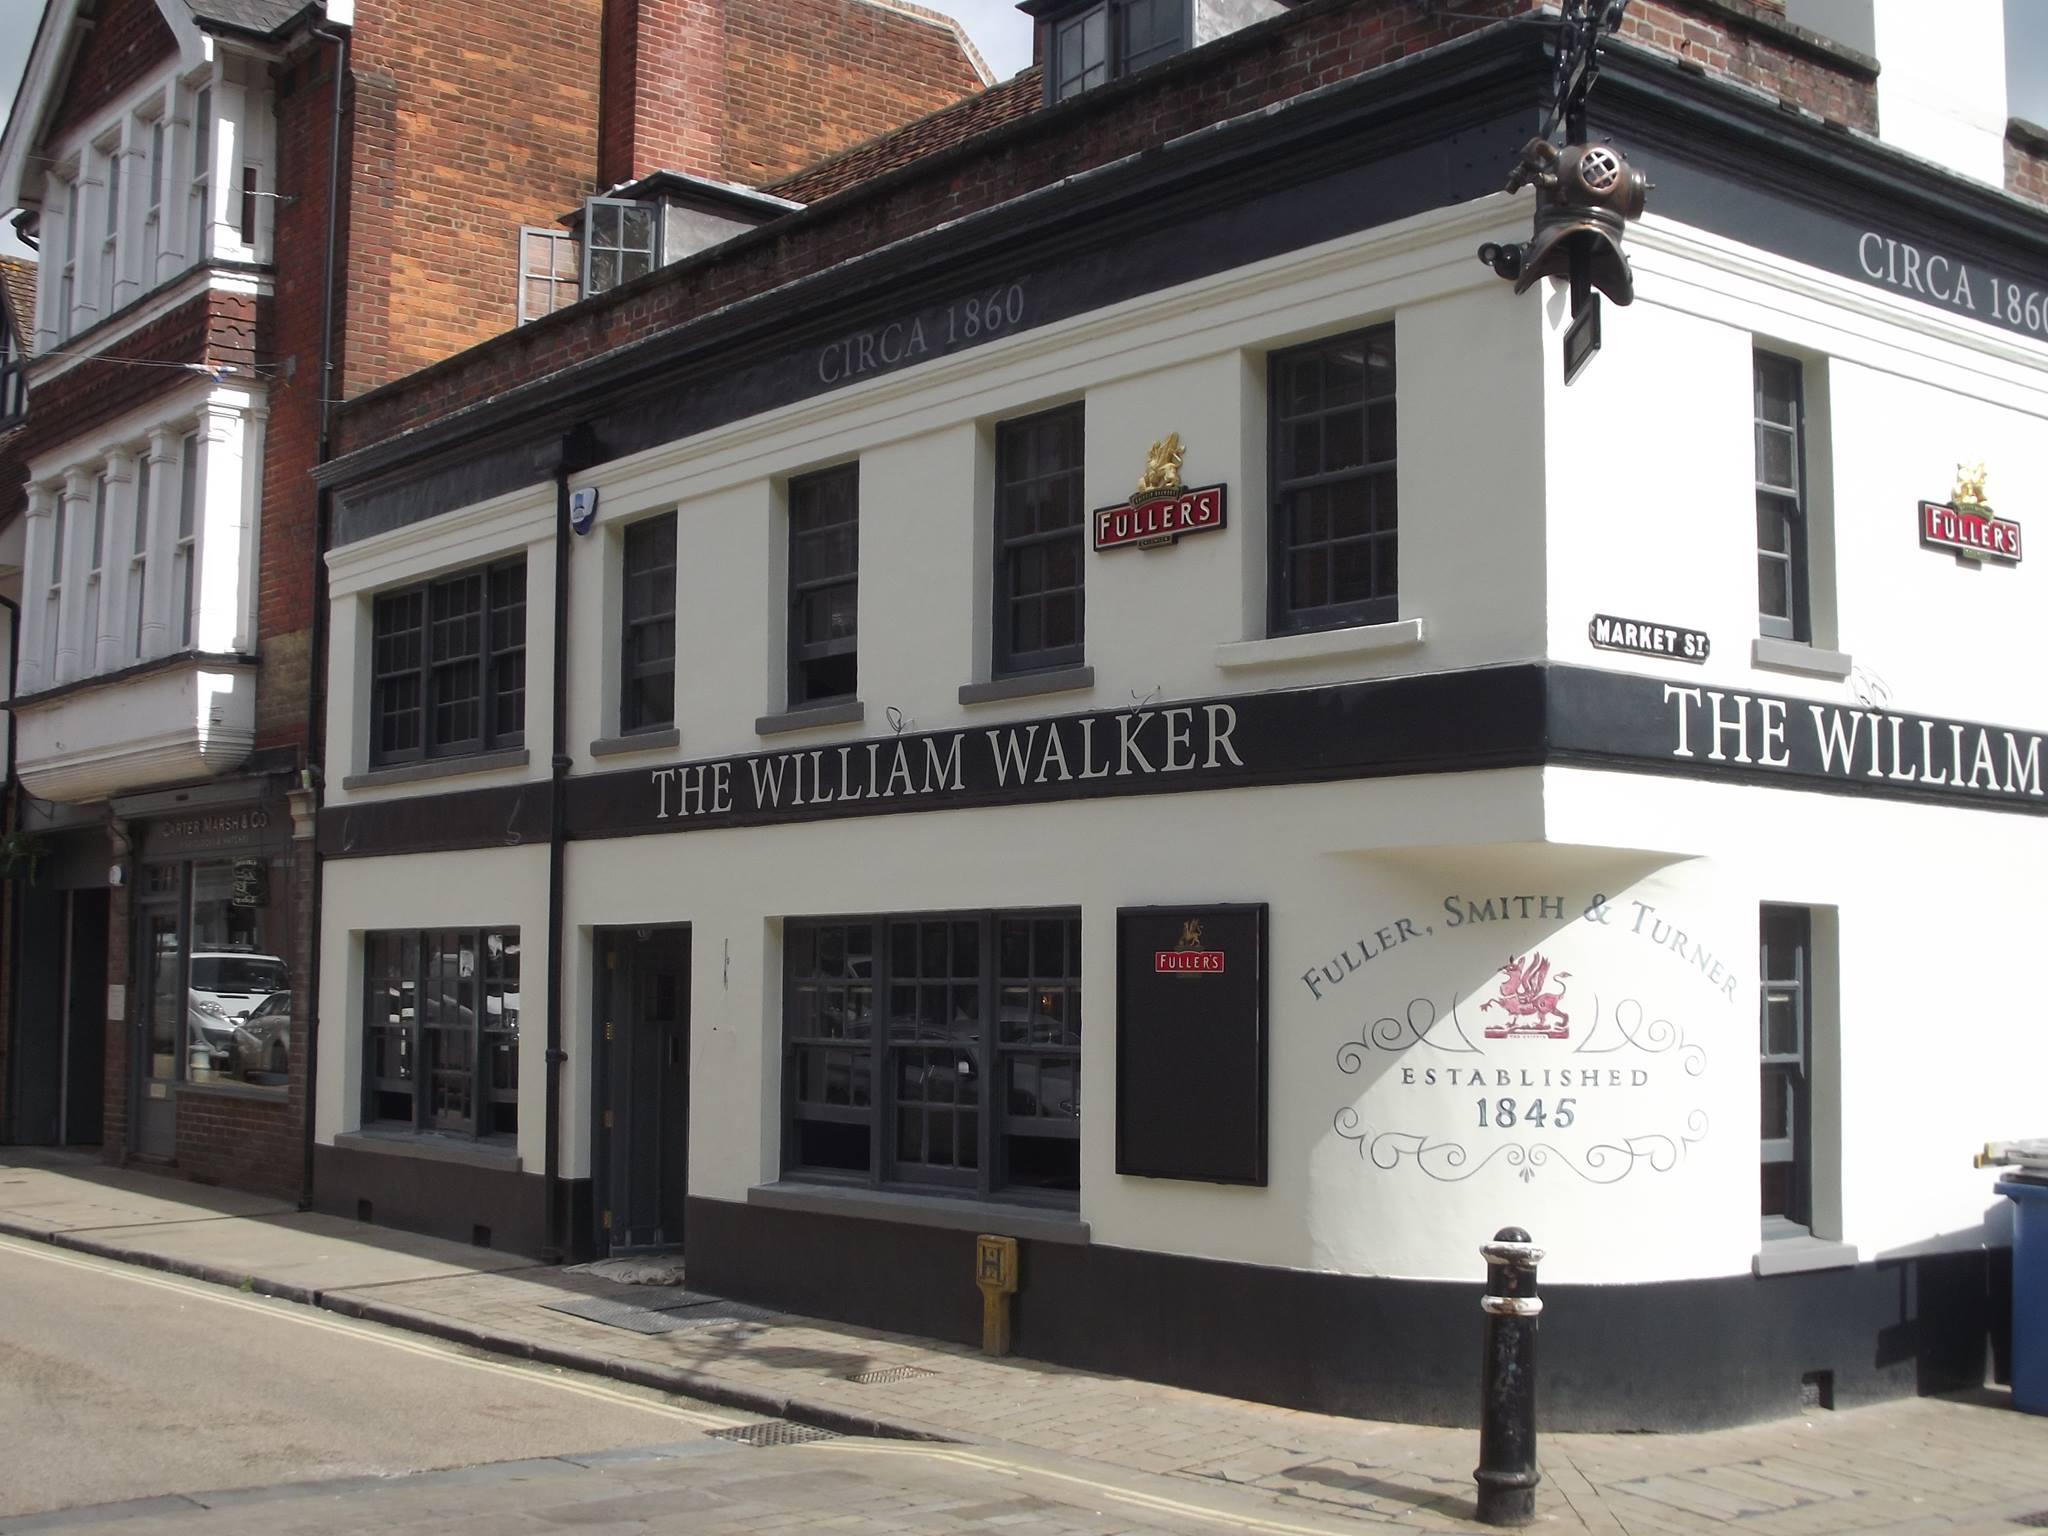 The William Walker